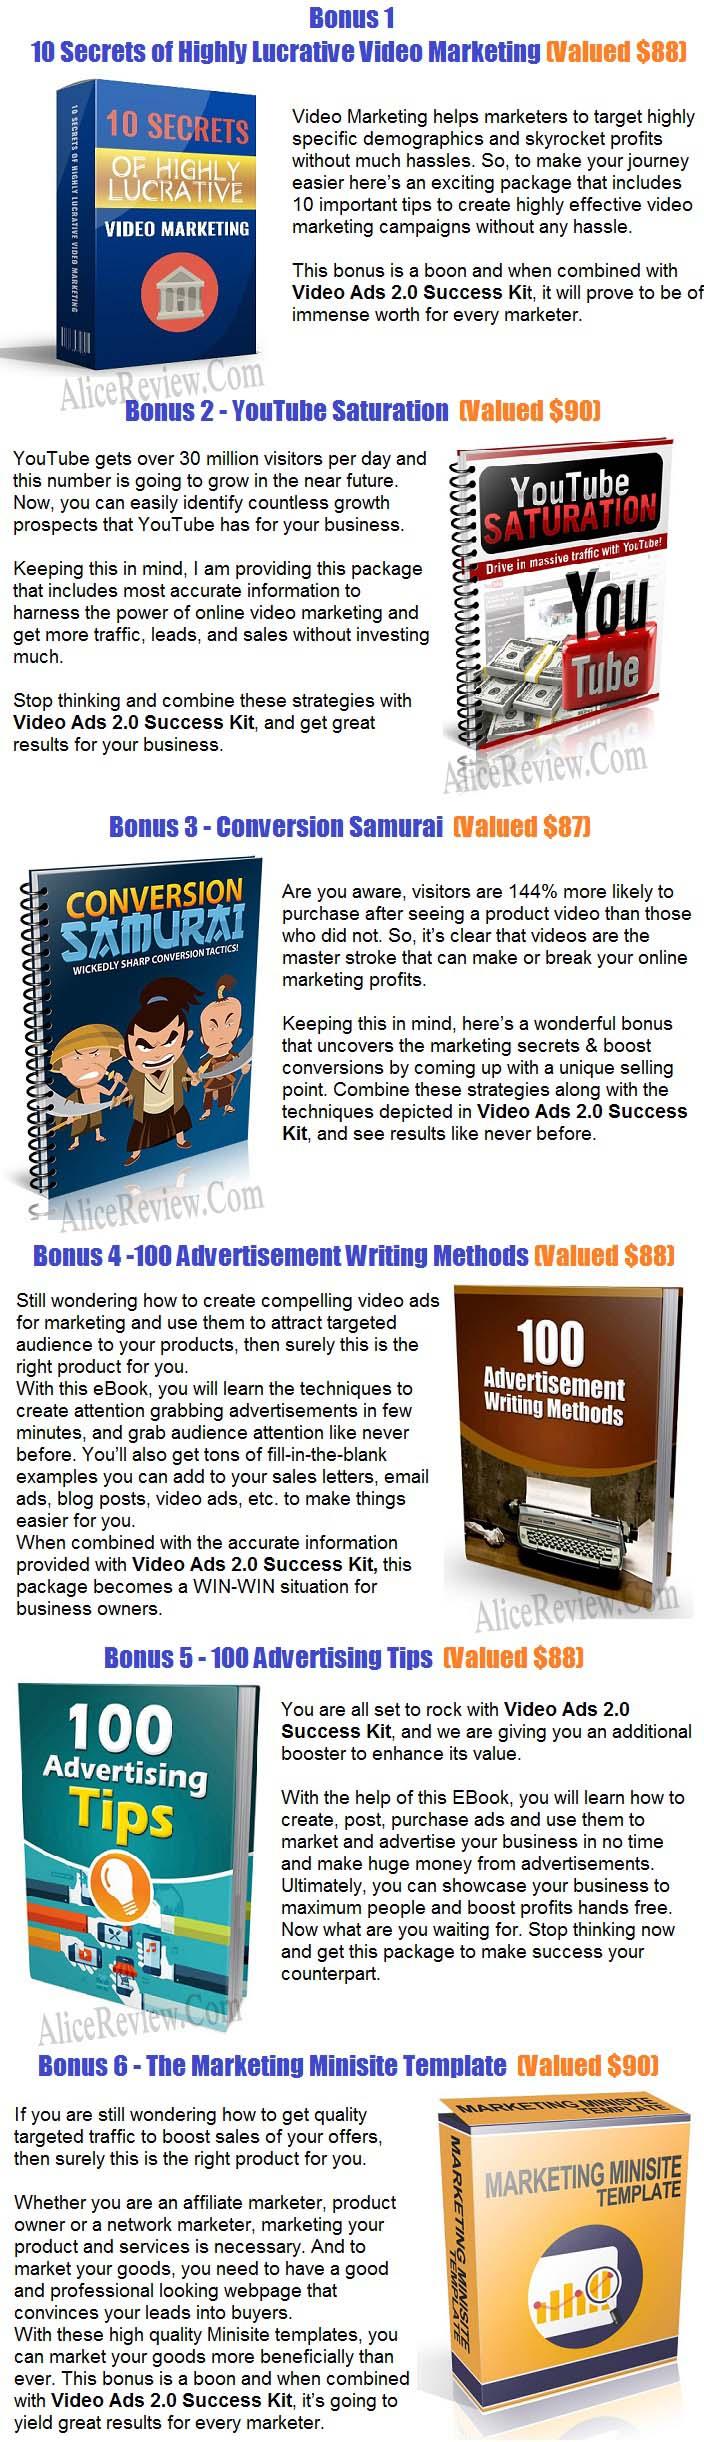 Video Ads 2.0 Success Kit PLR Bonus